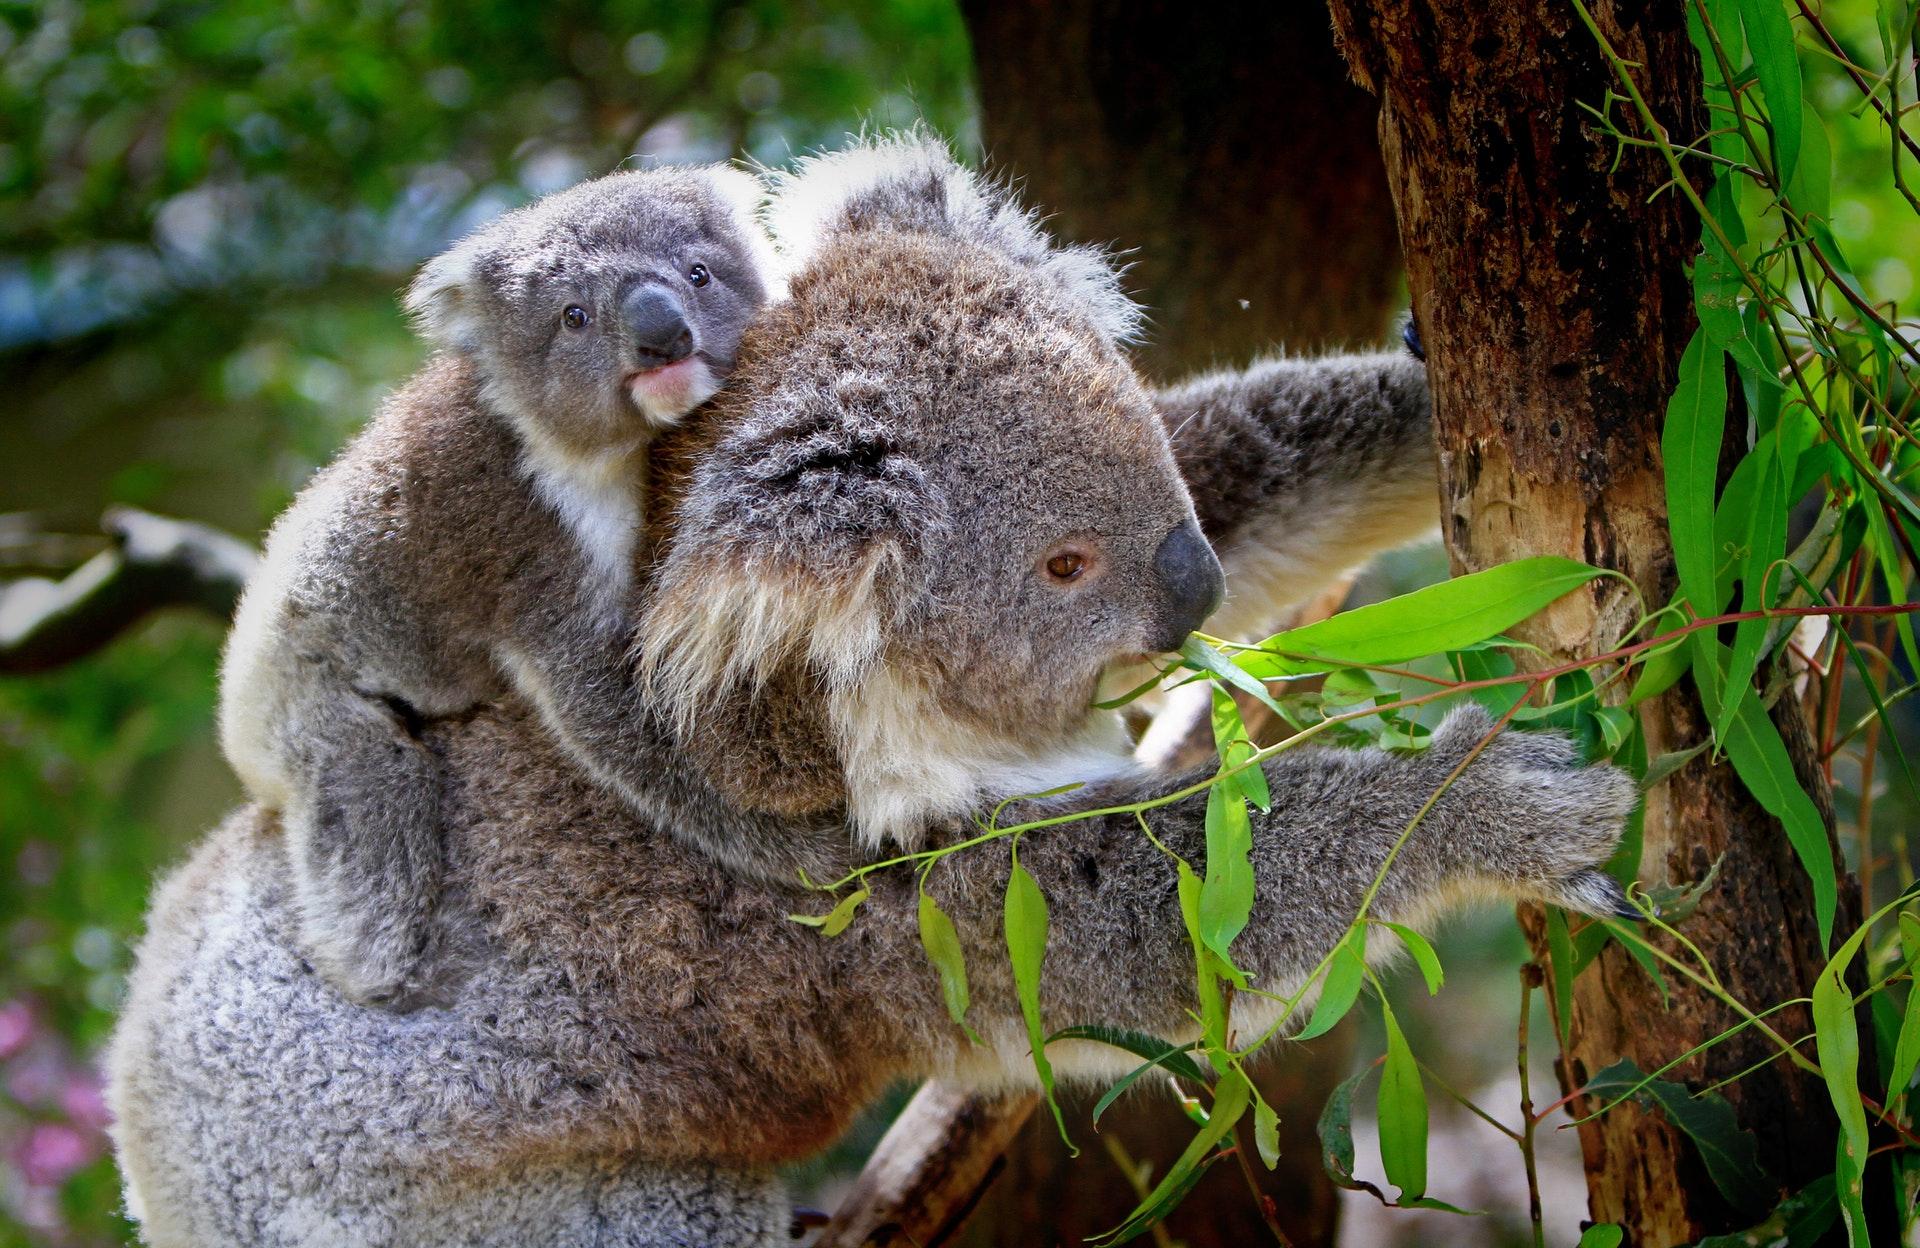 download wallpaper: koala's wallpaper